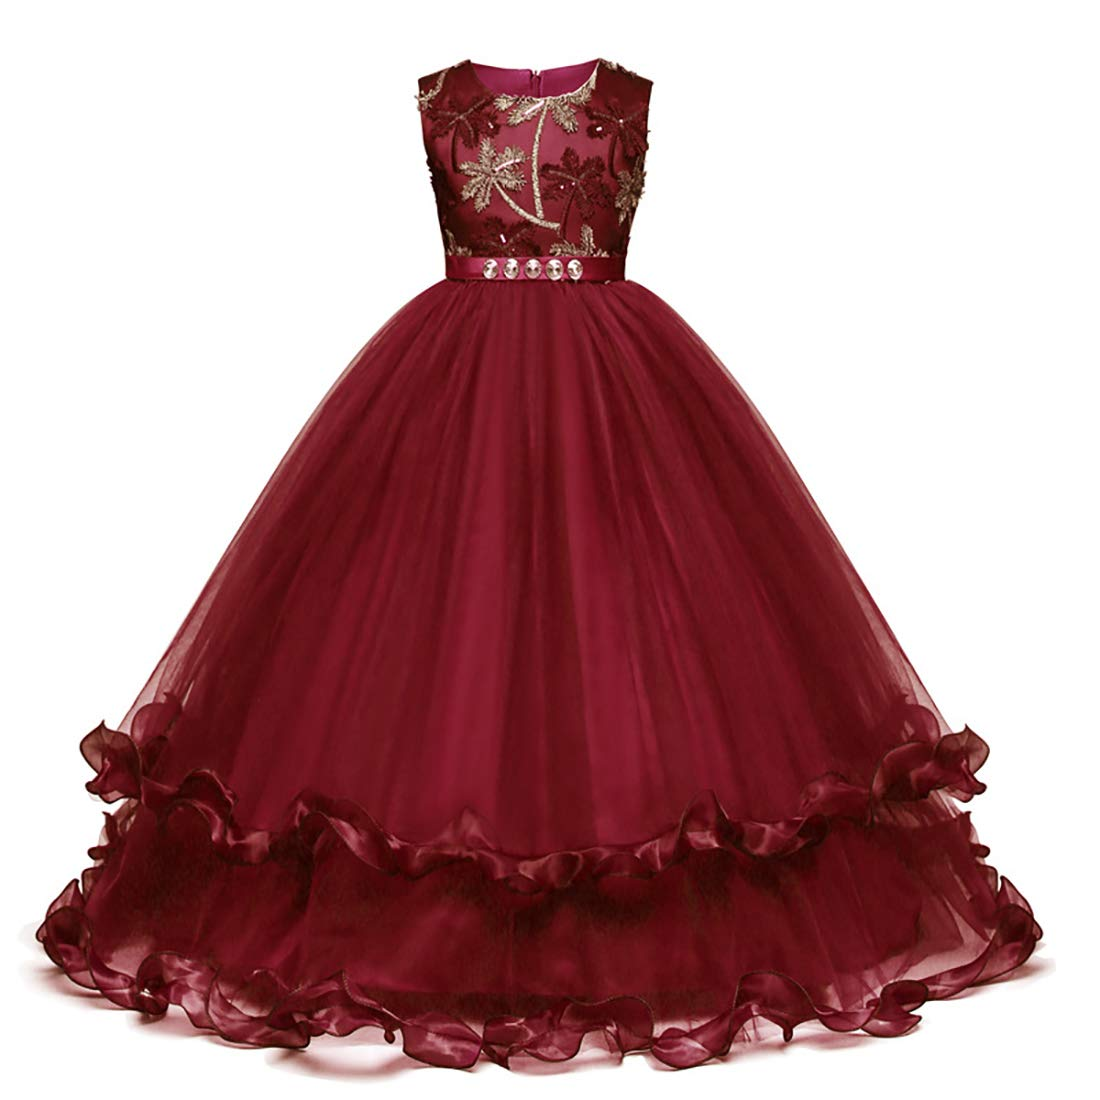 Fulision Girls Skirt Summer Sleeveles Princess Dress Party Show Tutu Fulision Co. Ltd